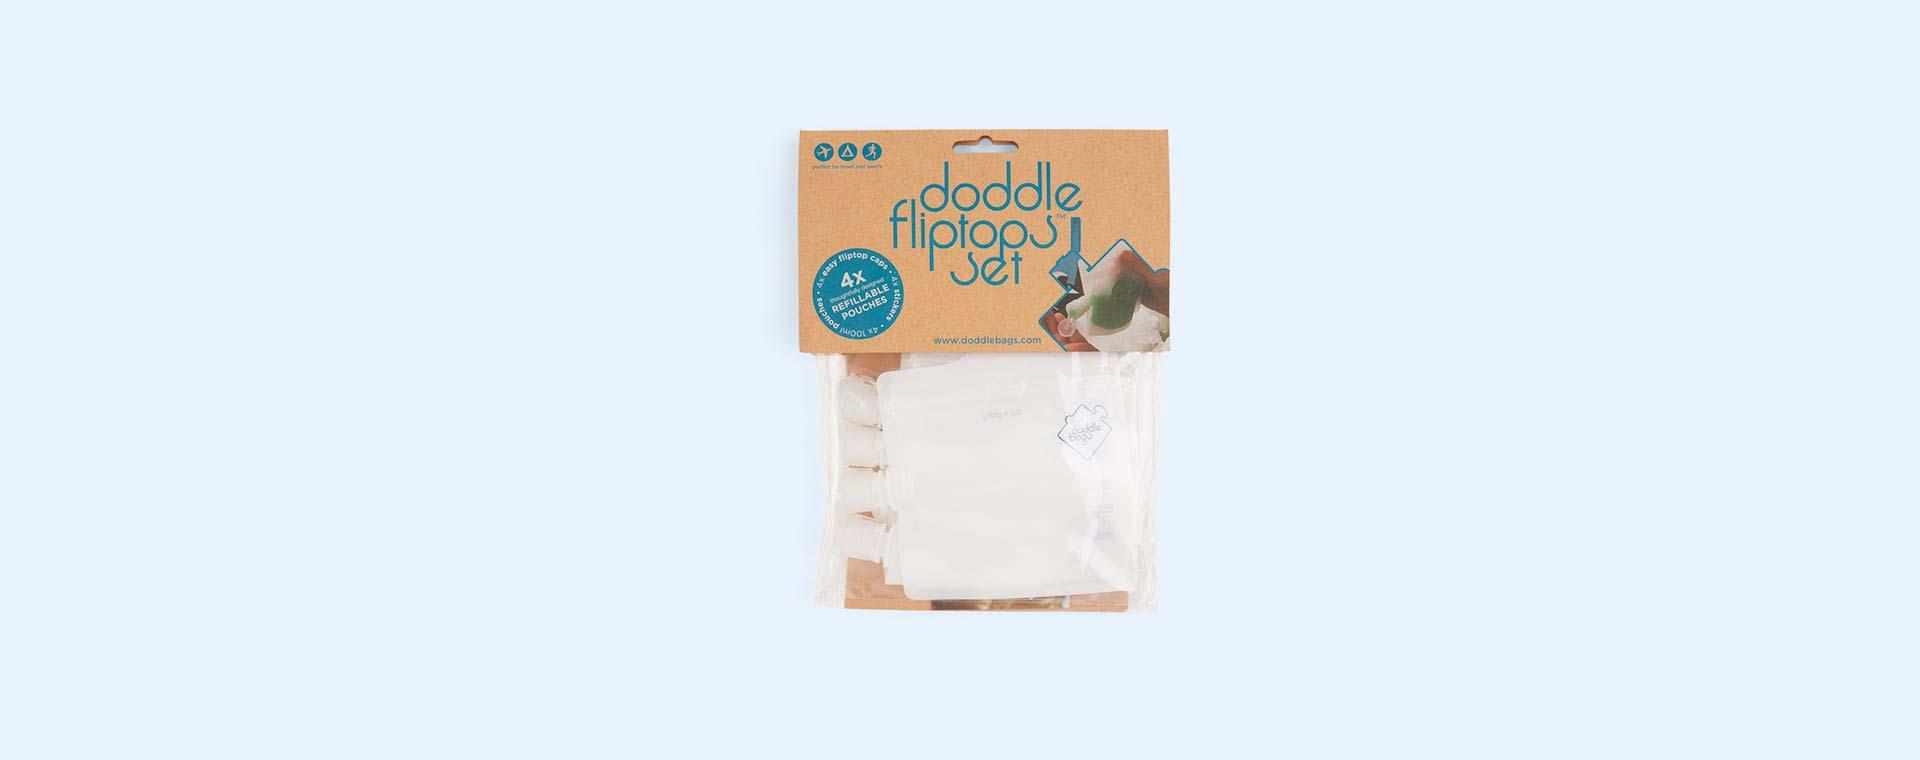 Multi DoddleBags Doddle Flip Top Set - 4 Pack